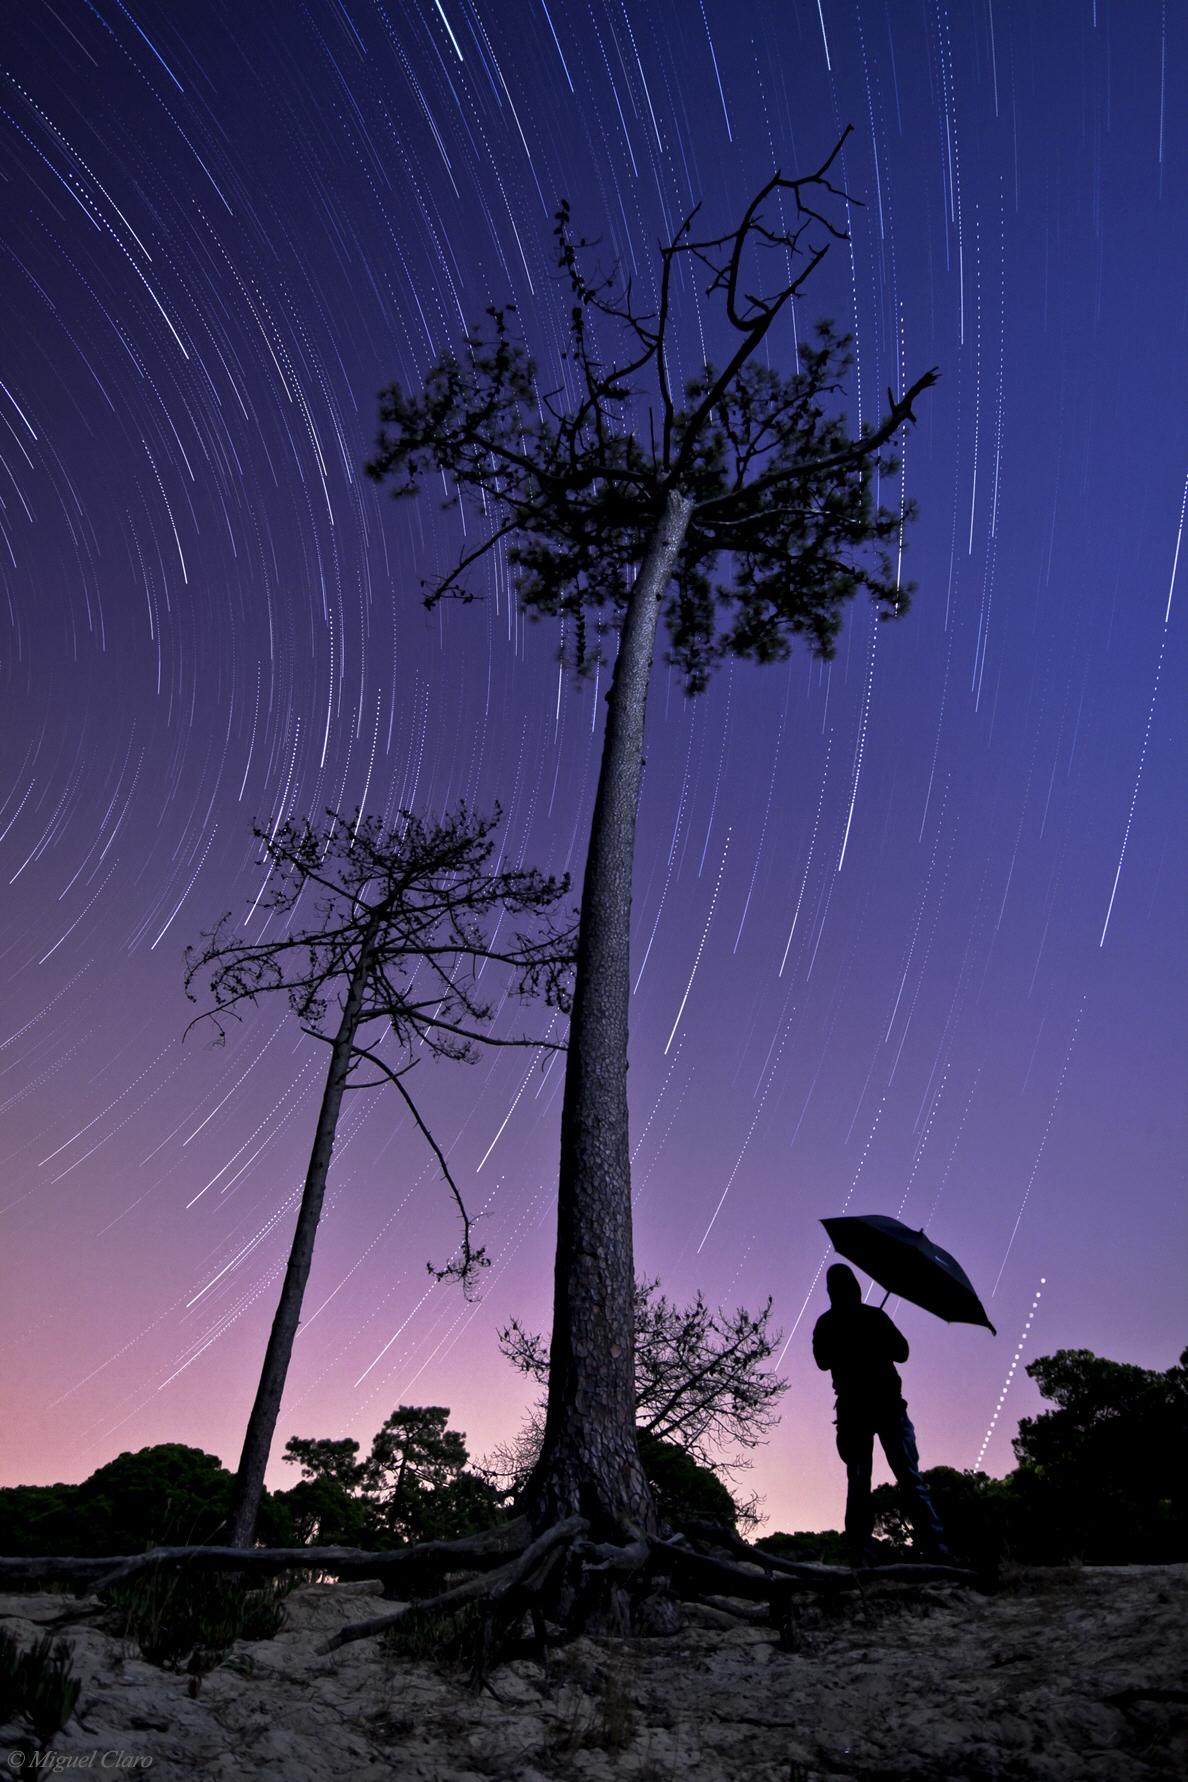 <h5>Raining Stars</h5>